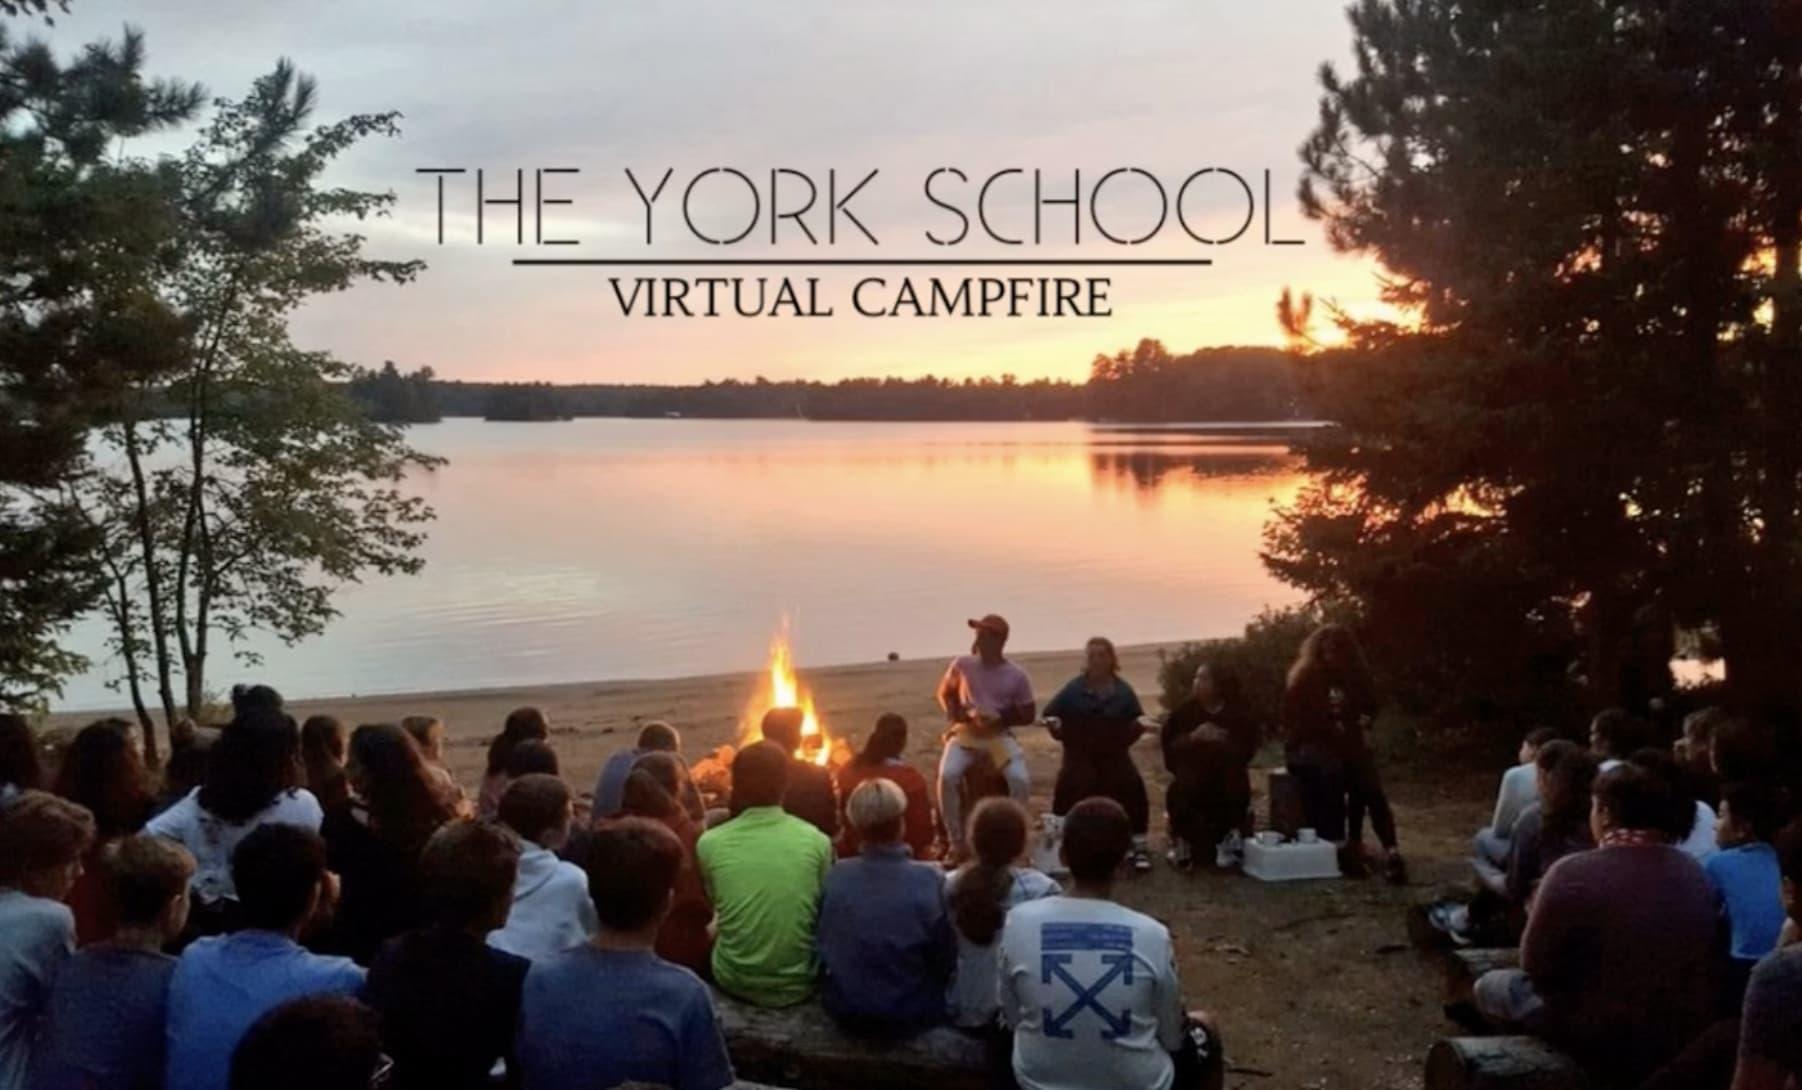 The York School Virtual Campfire